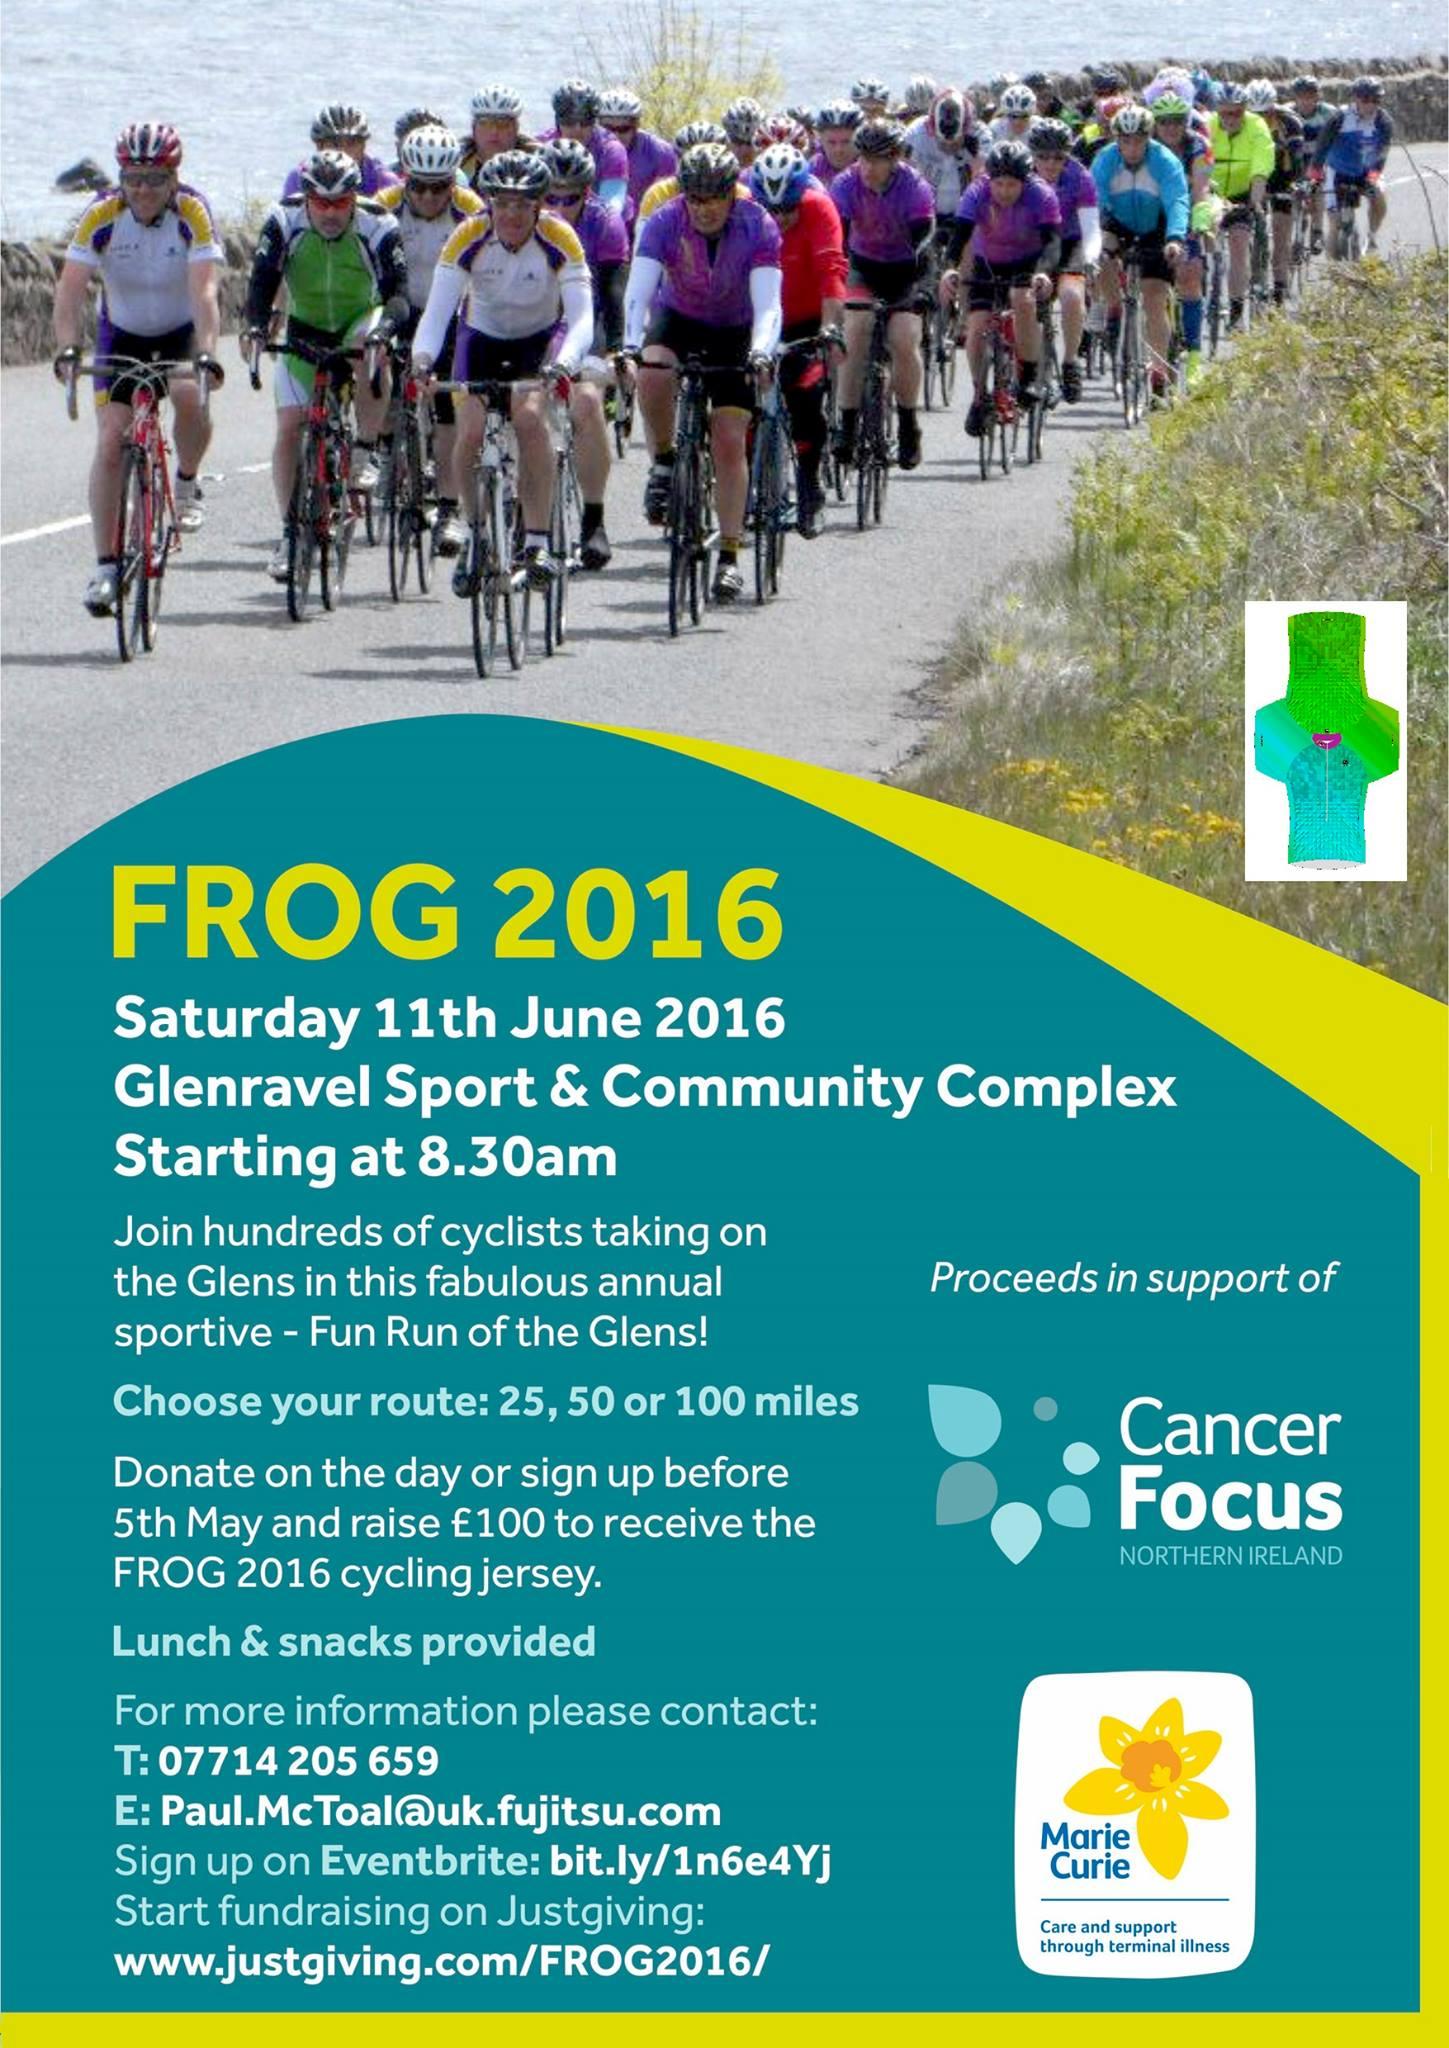 Frog 2016